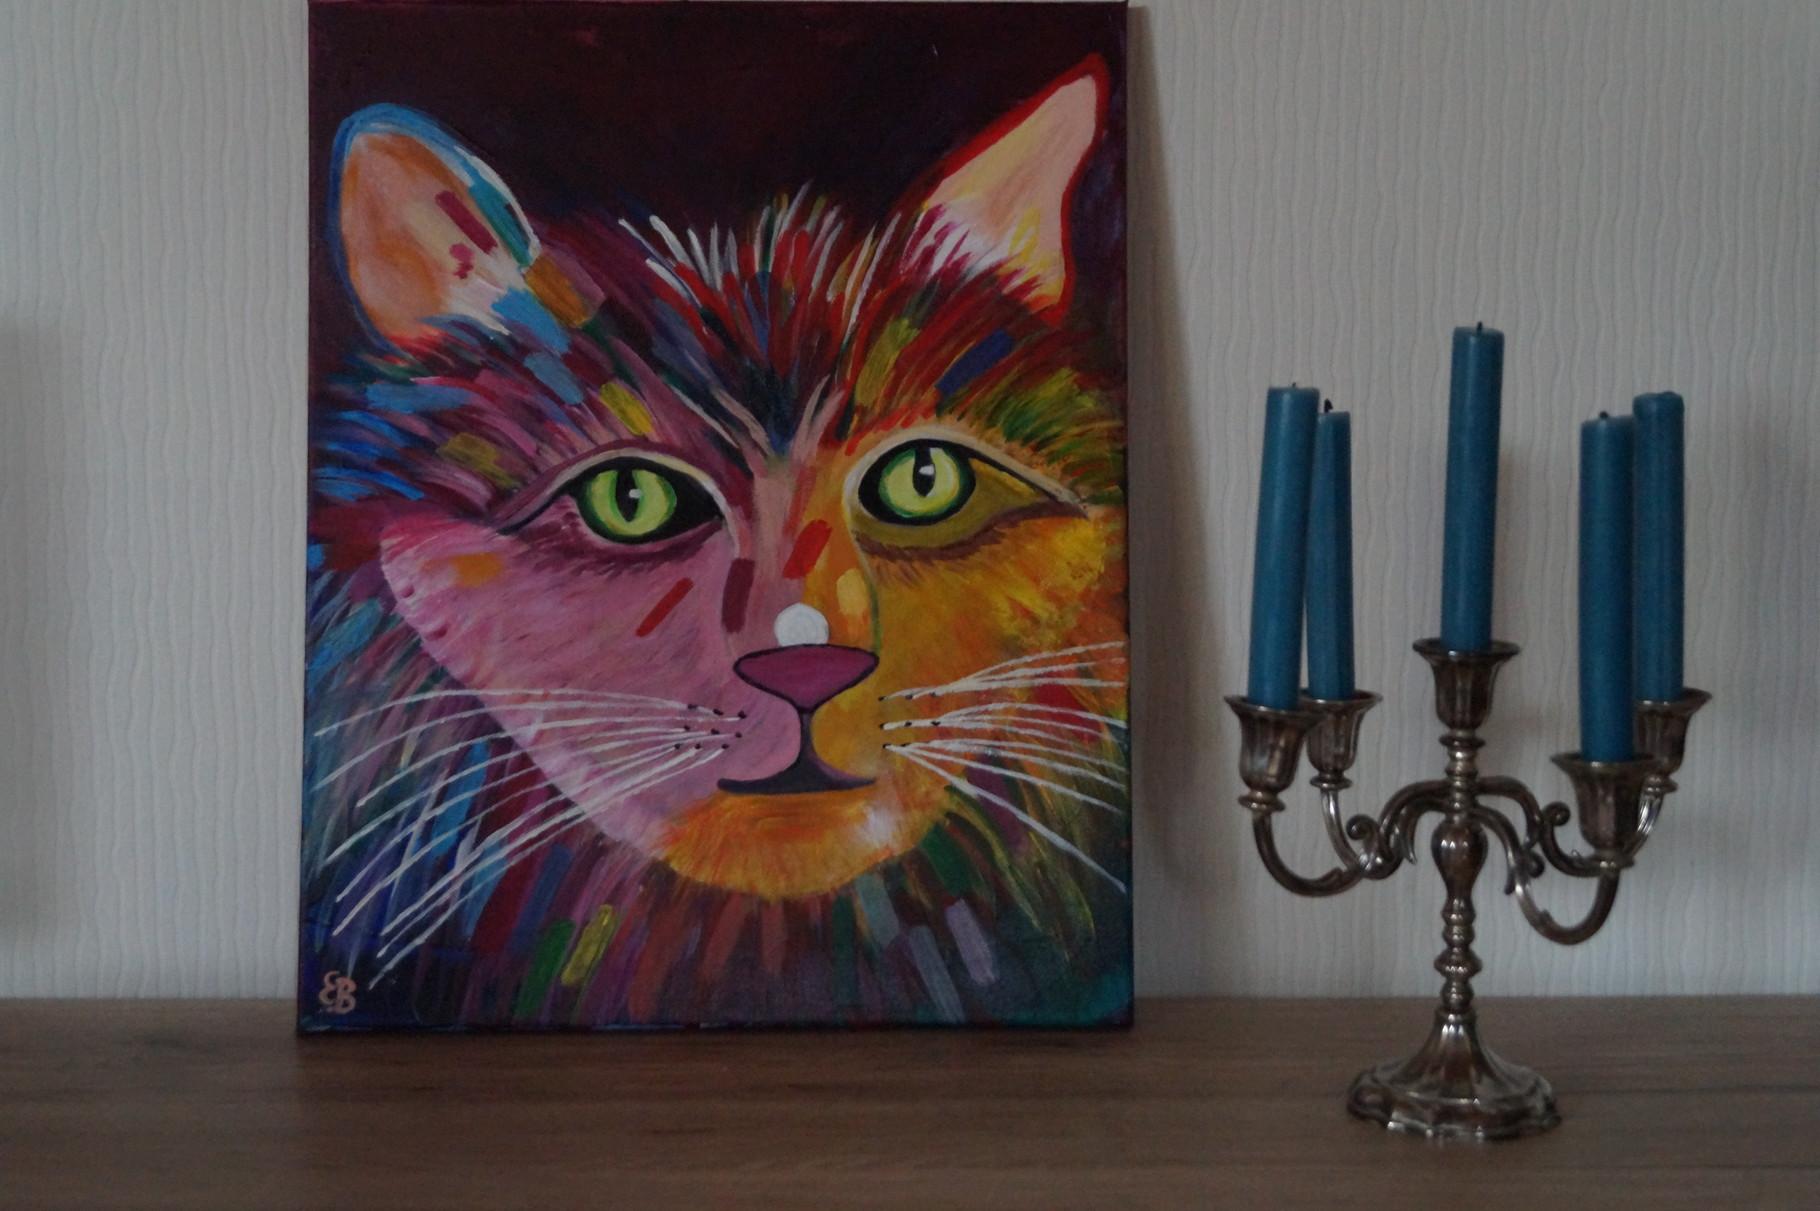 Katze - 50 x 40 cm - Acryl